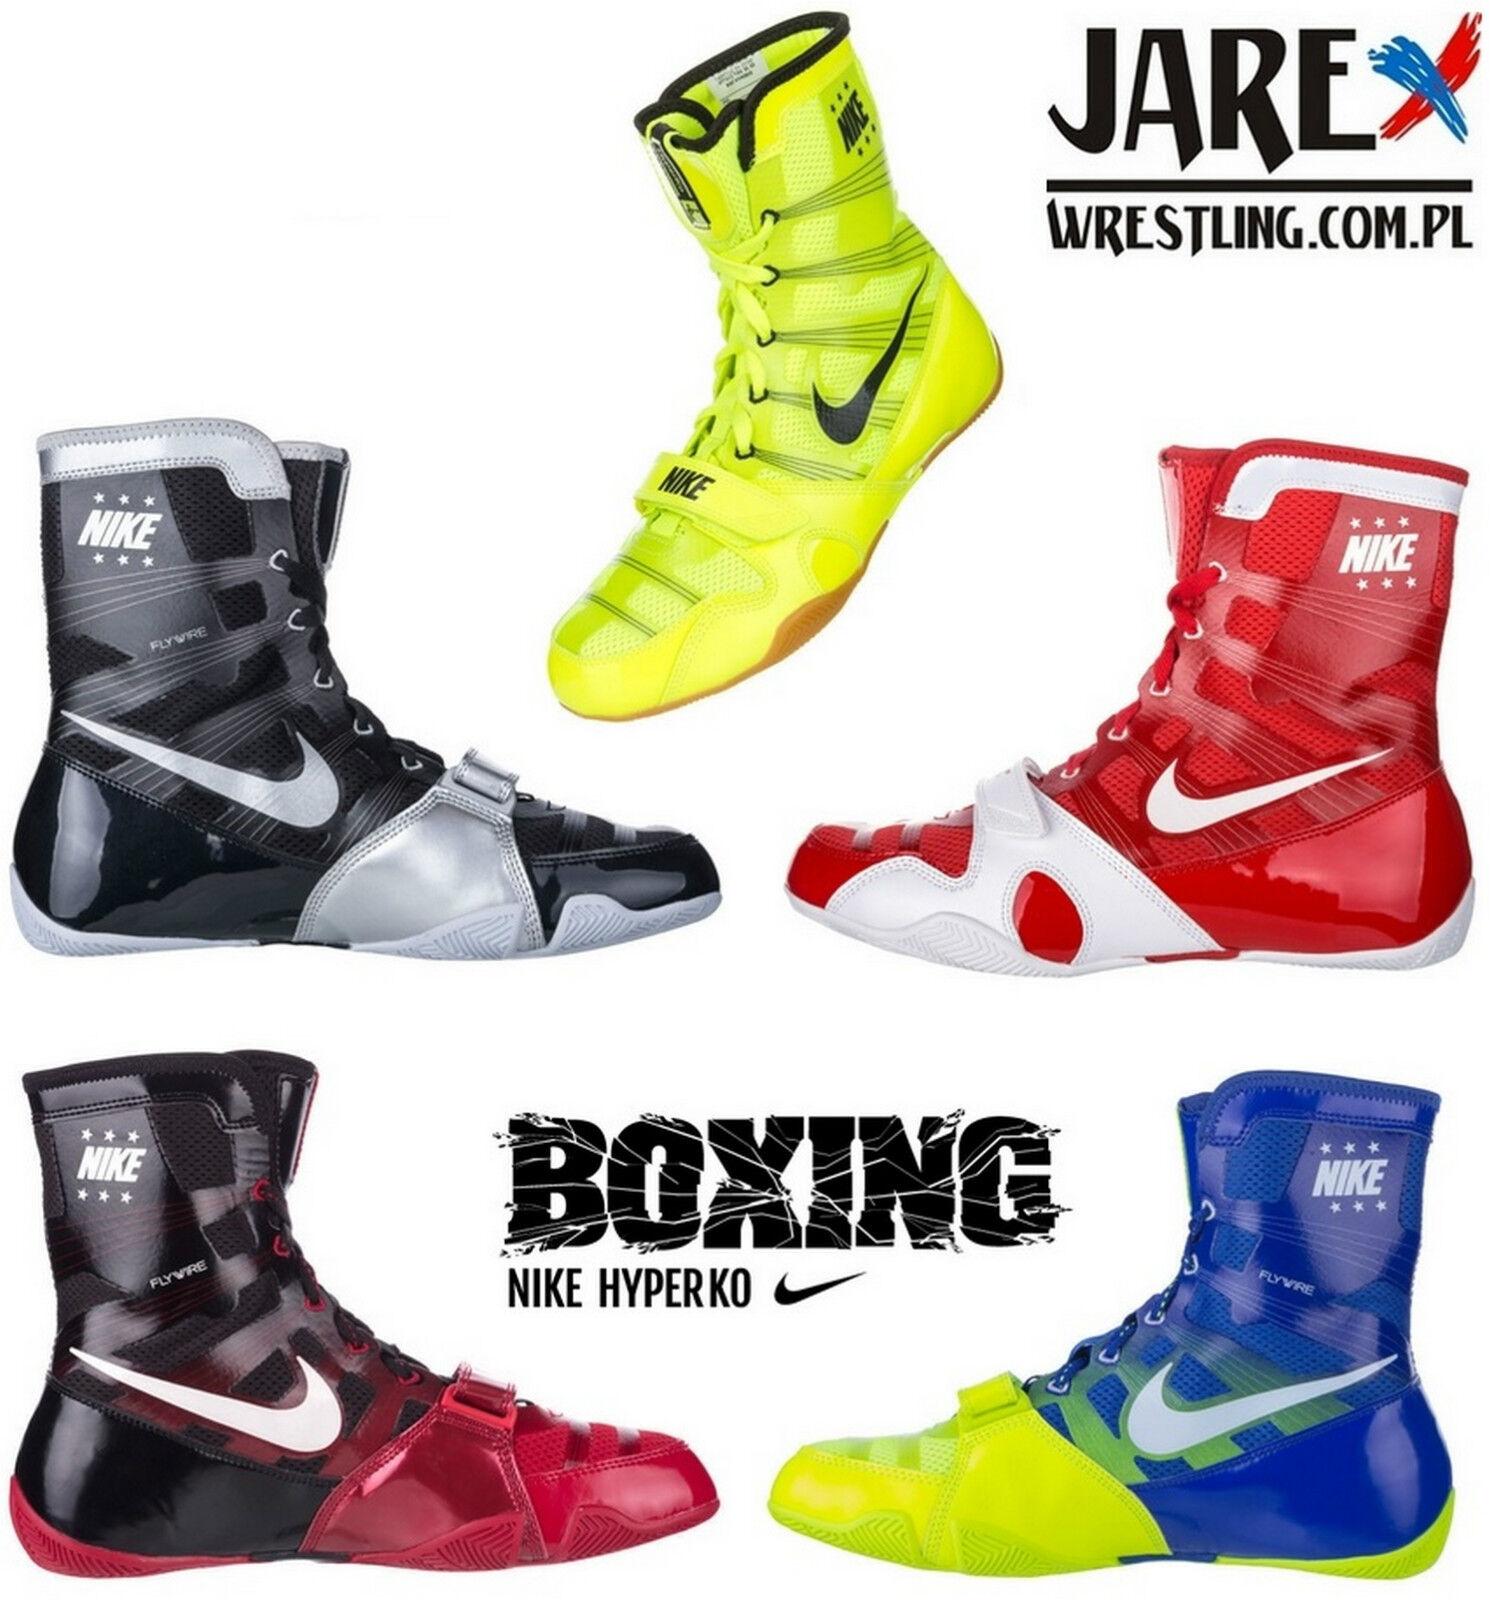 Nike HyperKO MP Boxing Stiefel Boxen Schuhe schuhe de Boxe